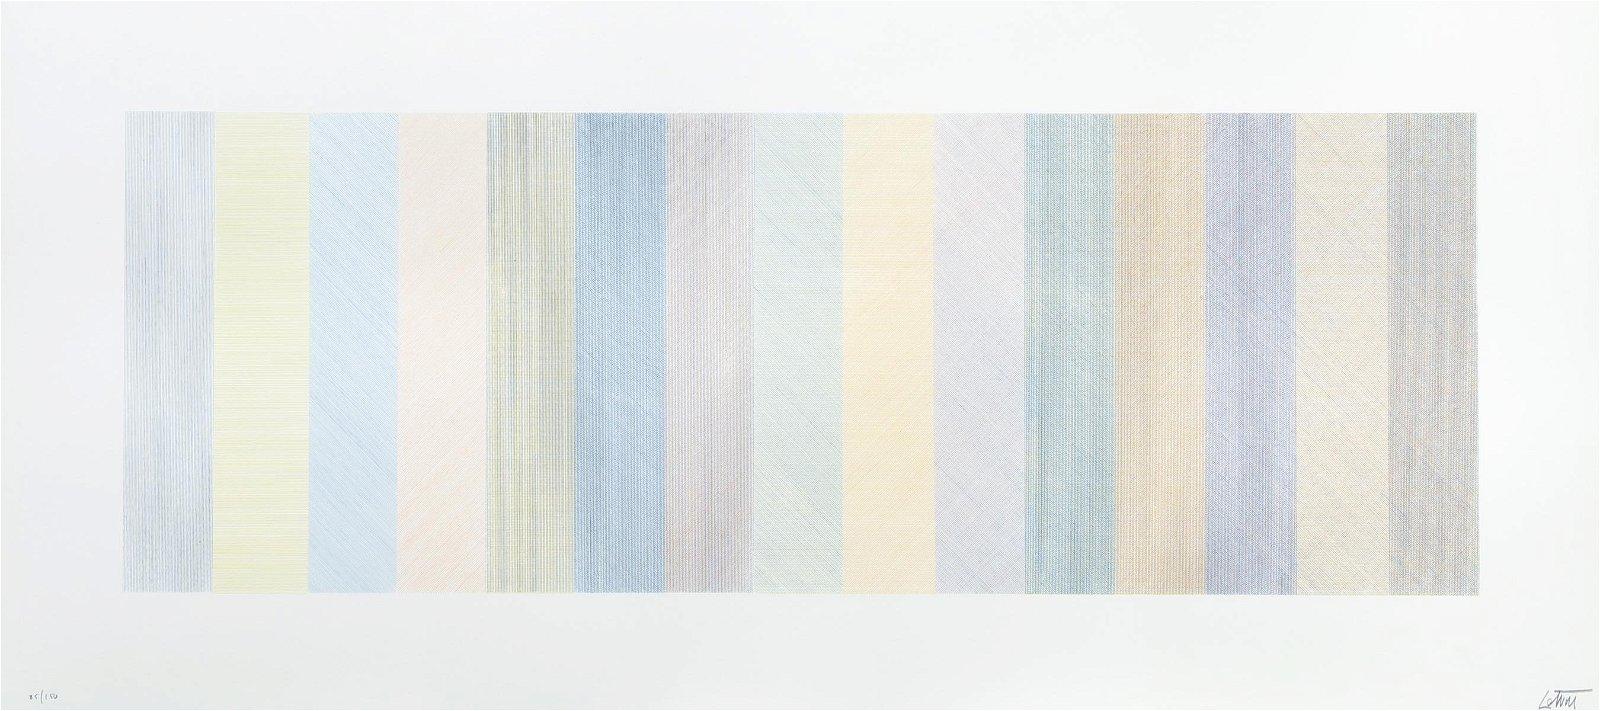 Sol LeWitt 1970 litho Horizontal Composite